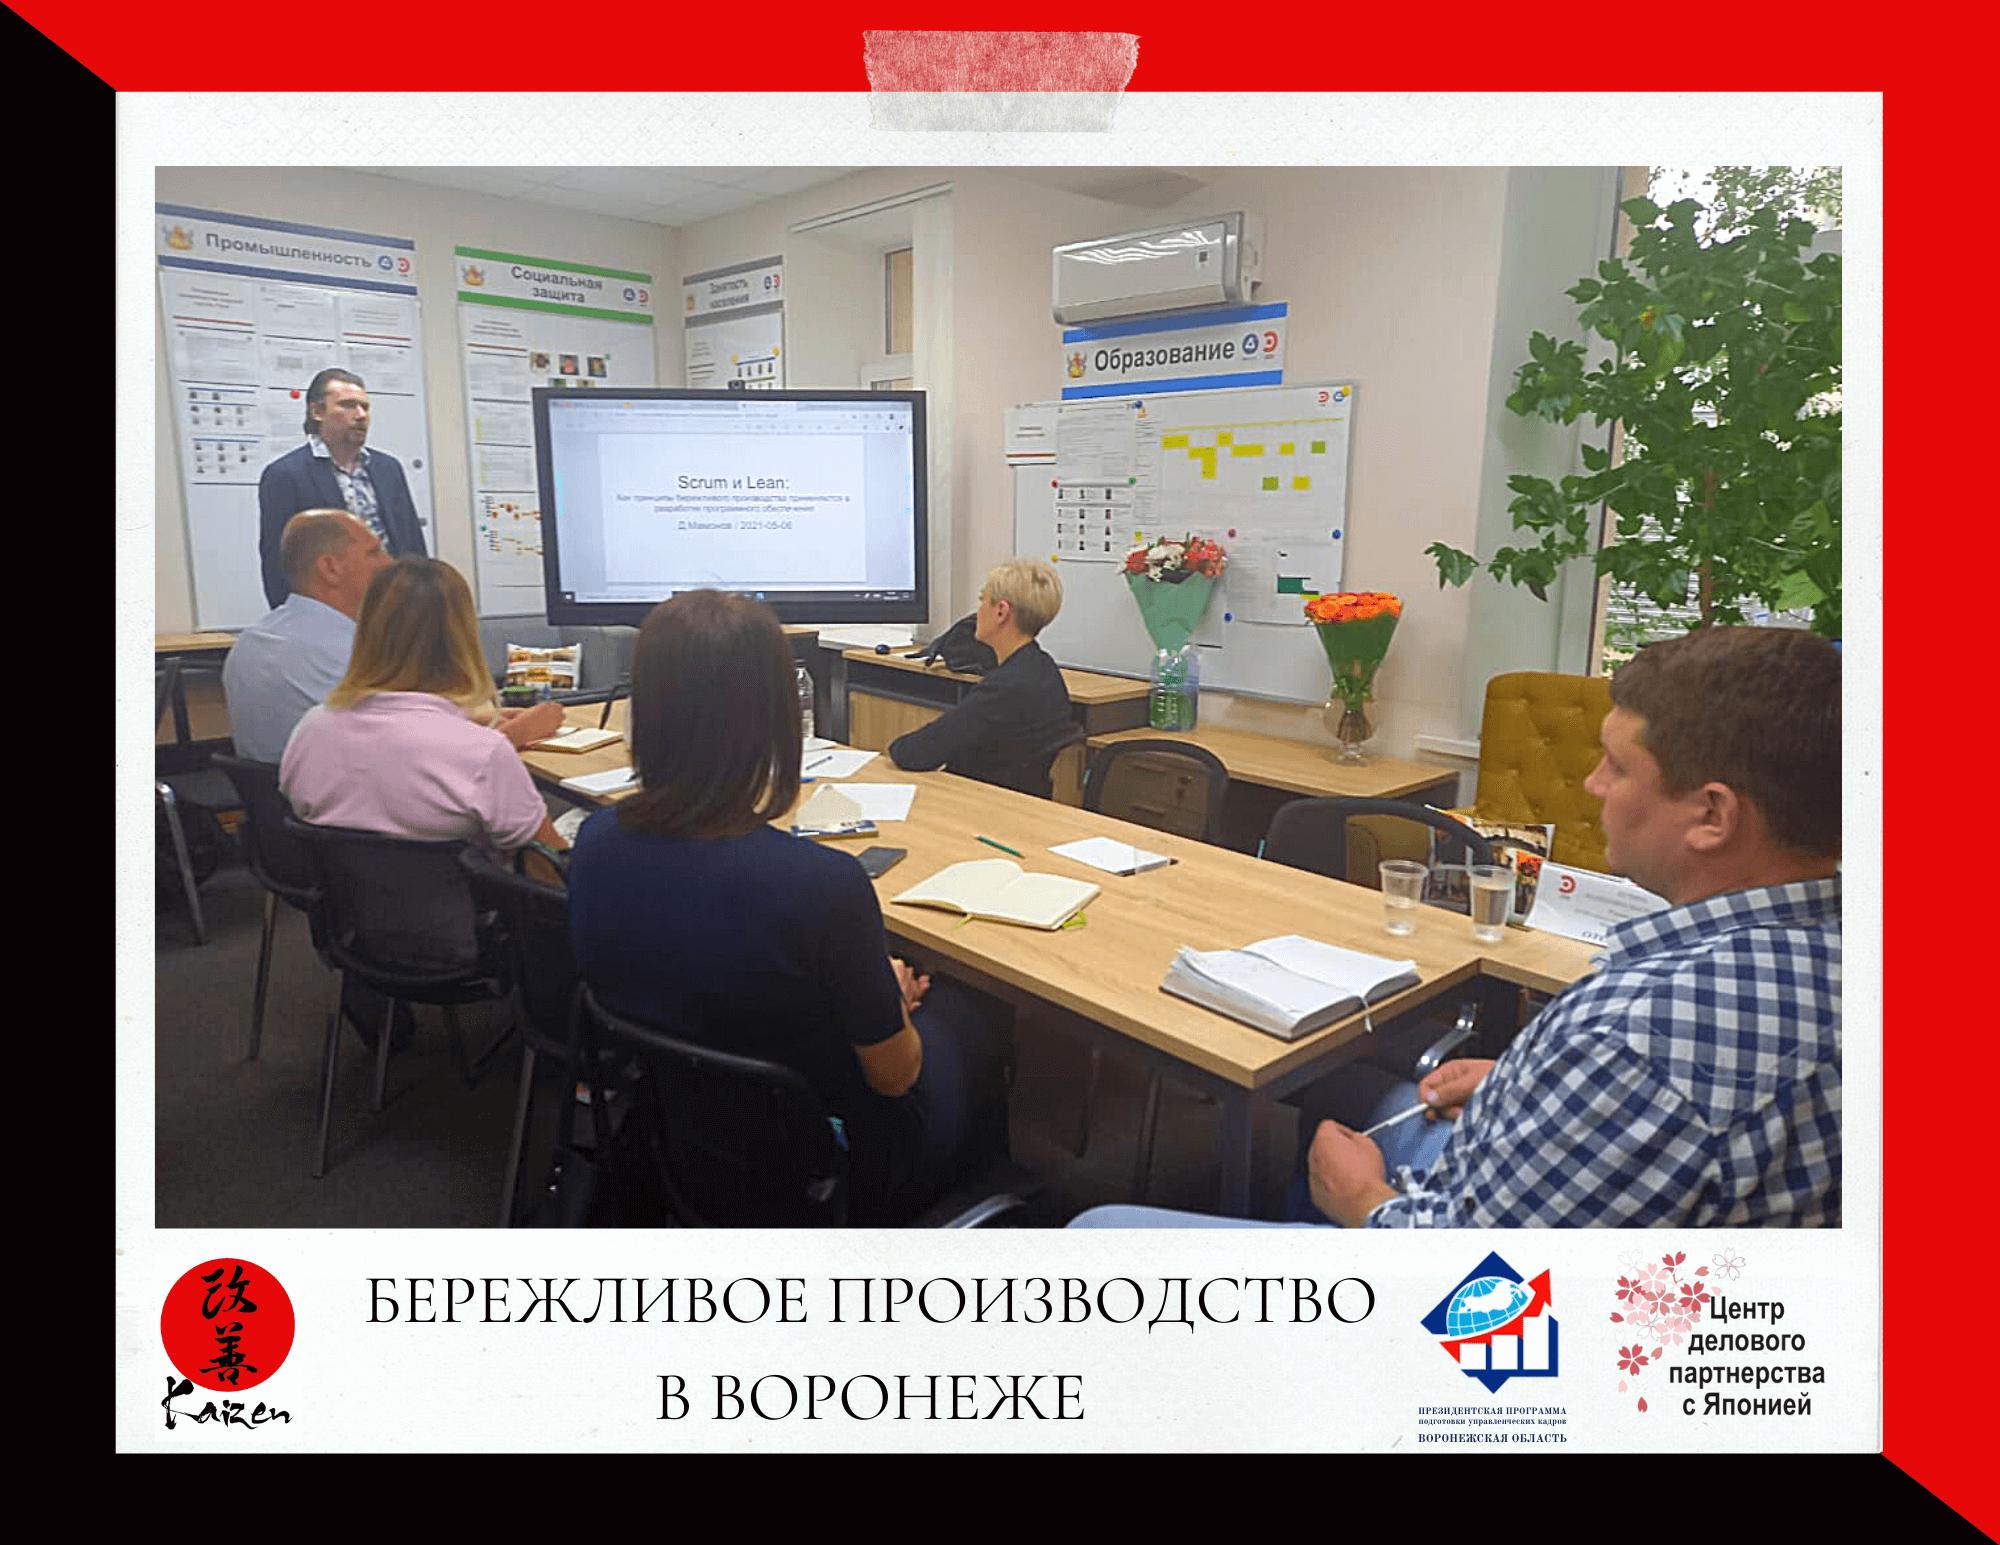 5-я встреча в рамках проекта «Кайдзен – бережливое производство в Воронеже»